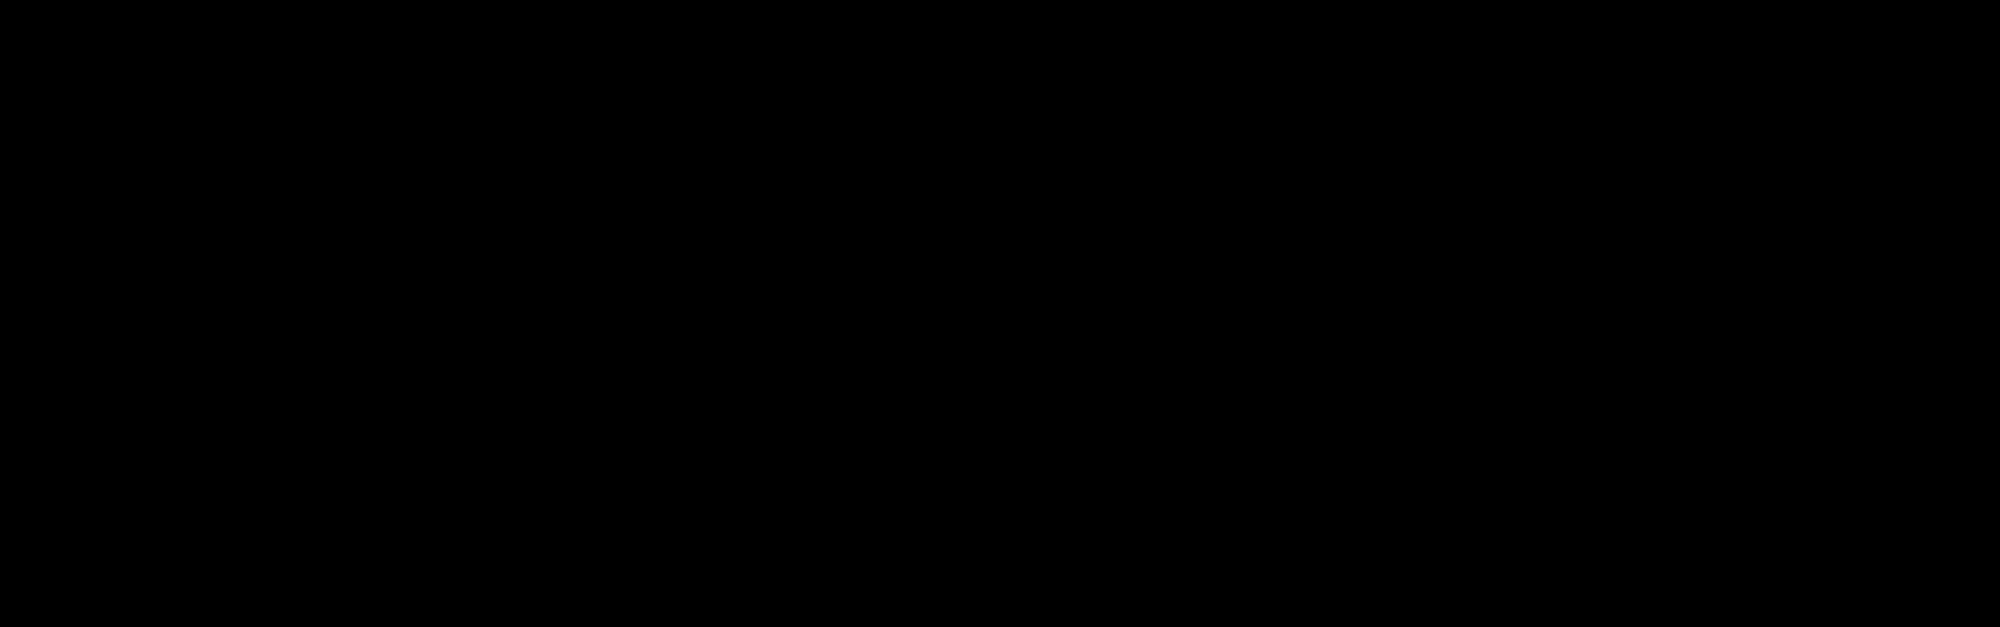 Logo - (R)-02